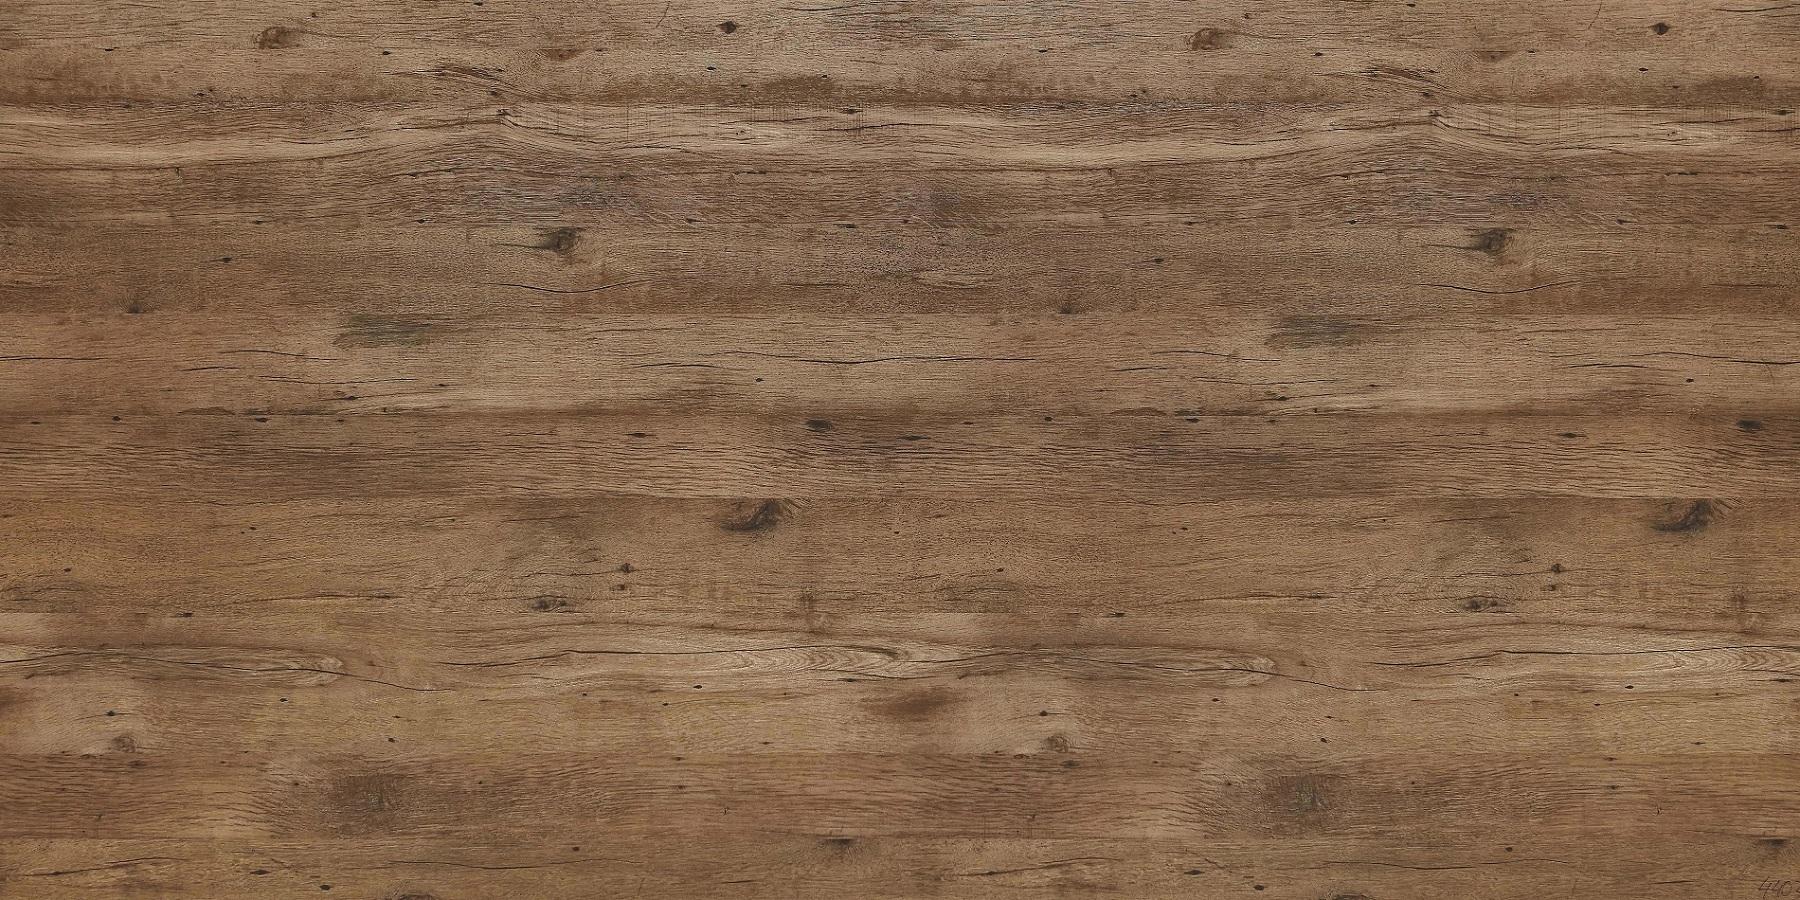 Mẫu vân gỗ Melamine